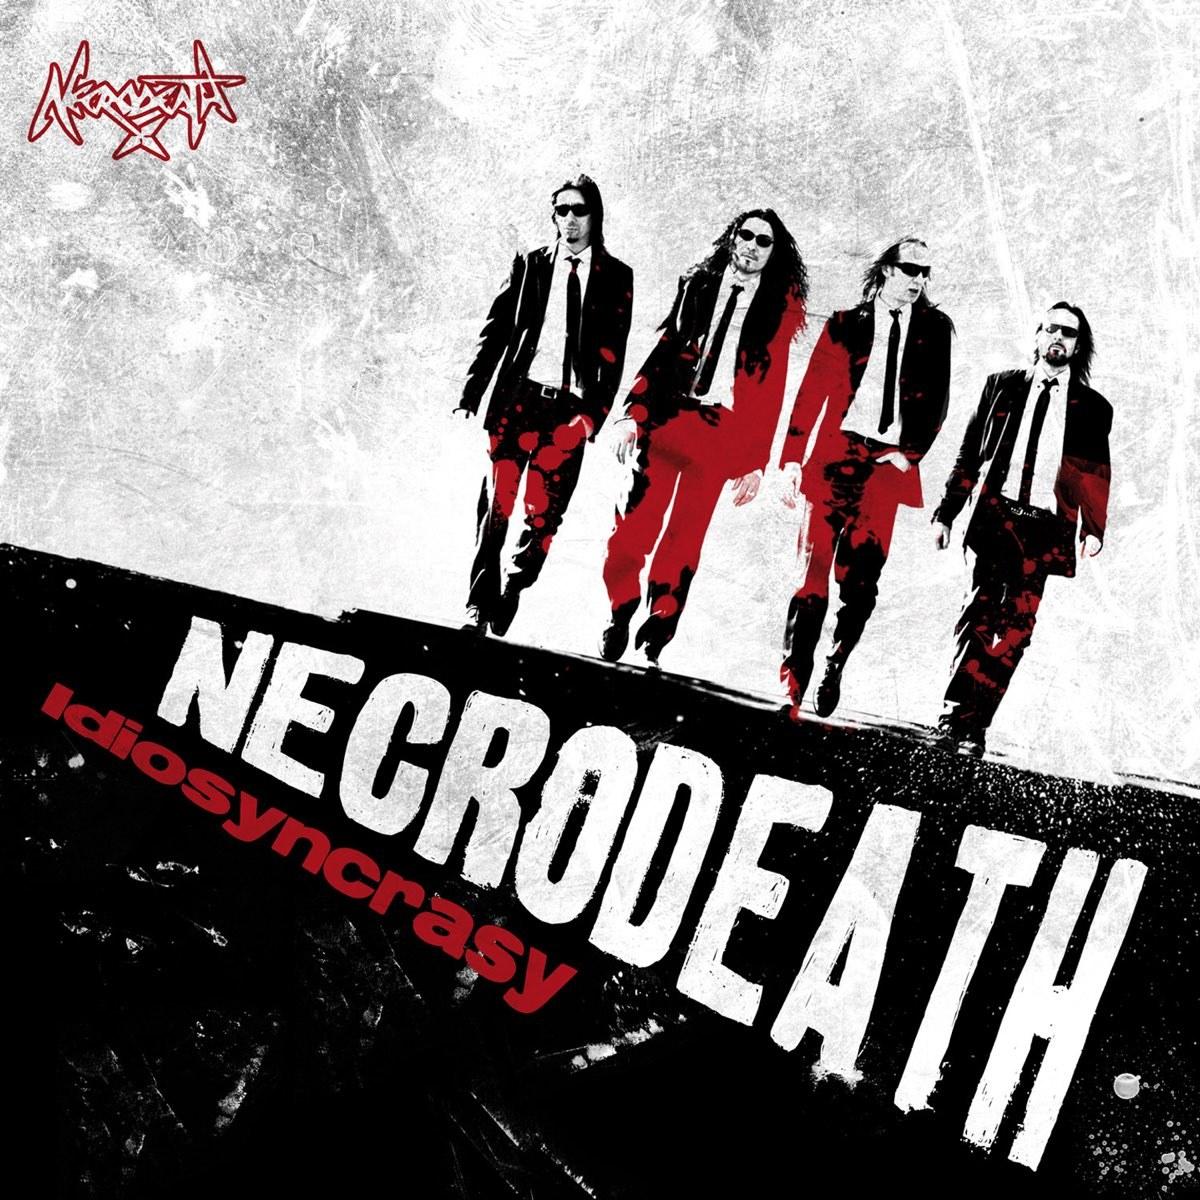 Review for Necrodeath - Idiosyncrasy